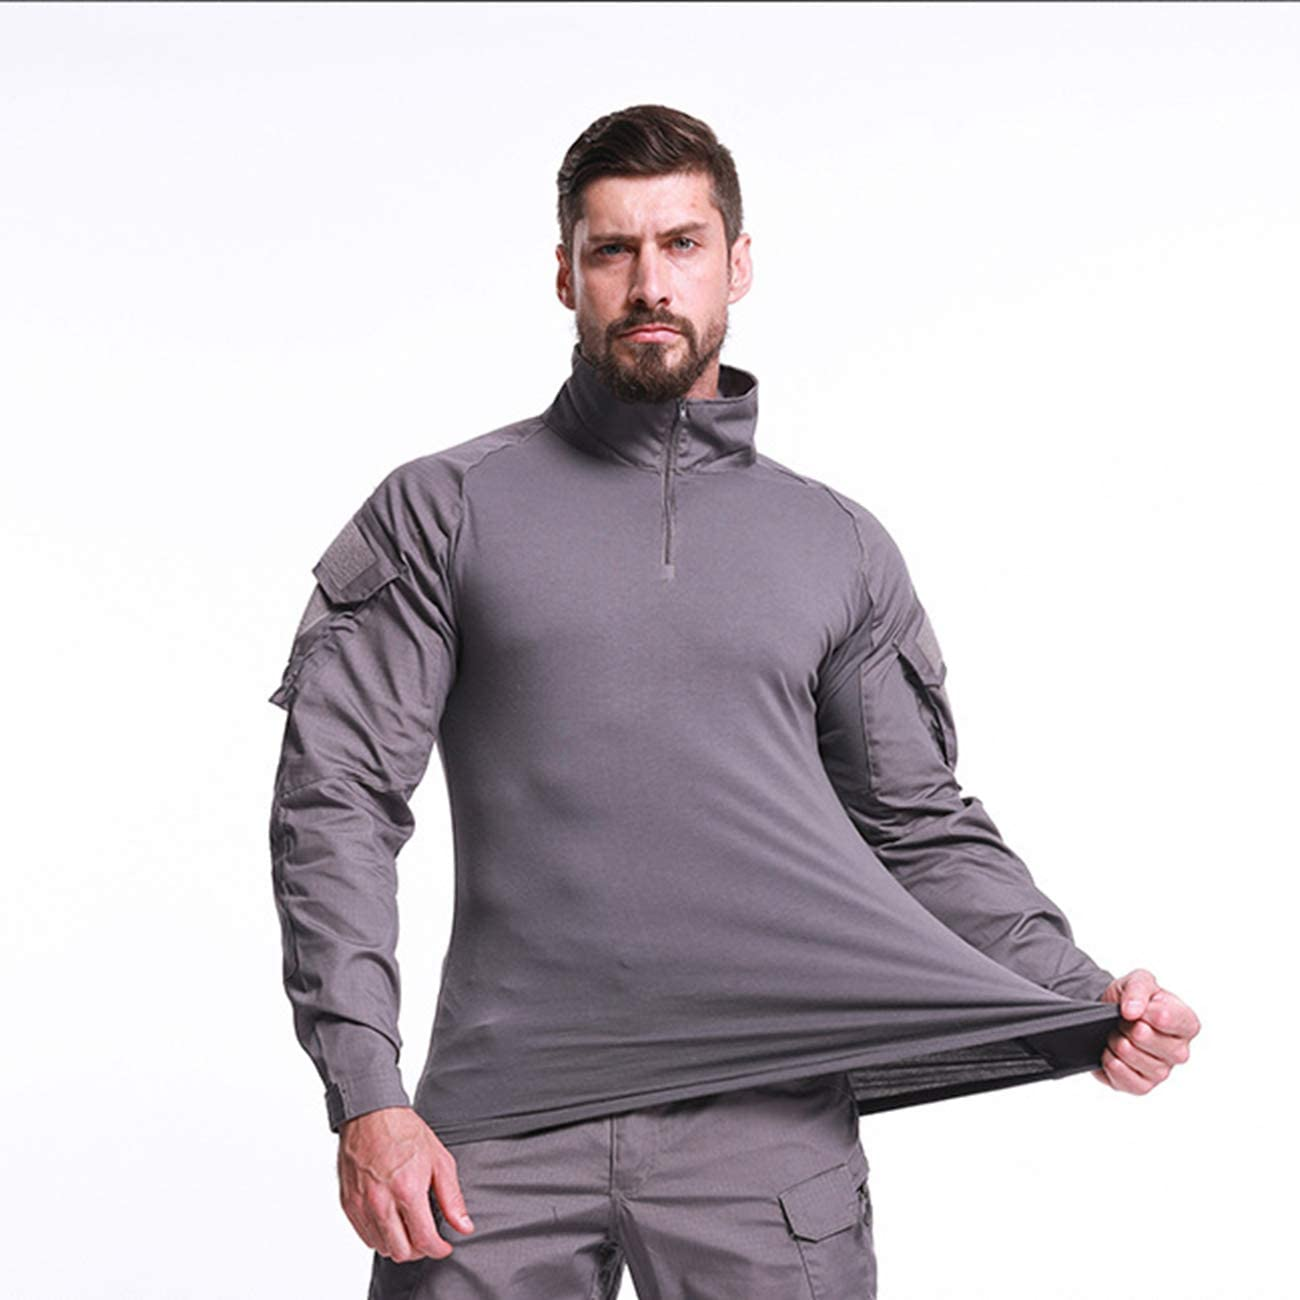 Military Ba Tactical Military Combat Long Sleeve